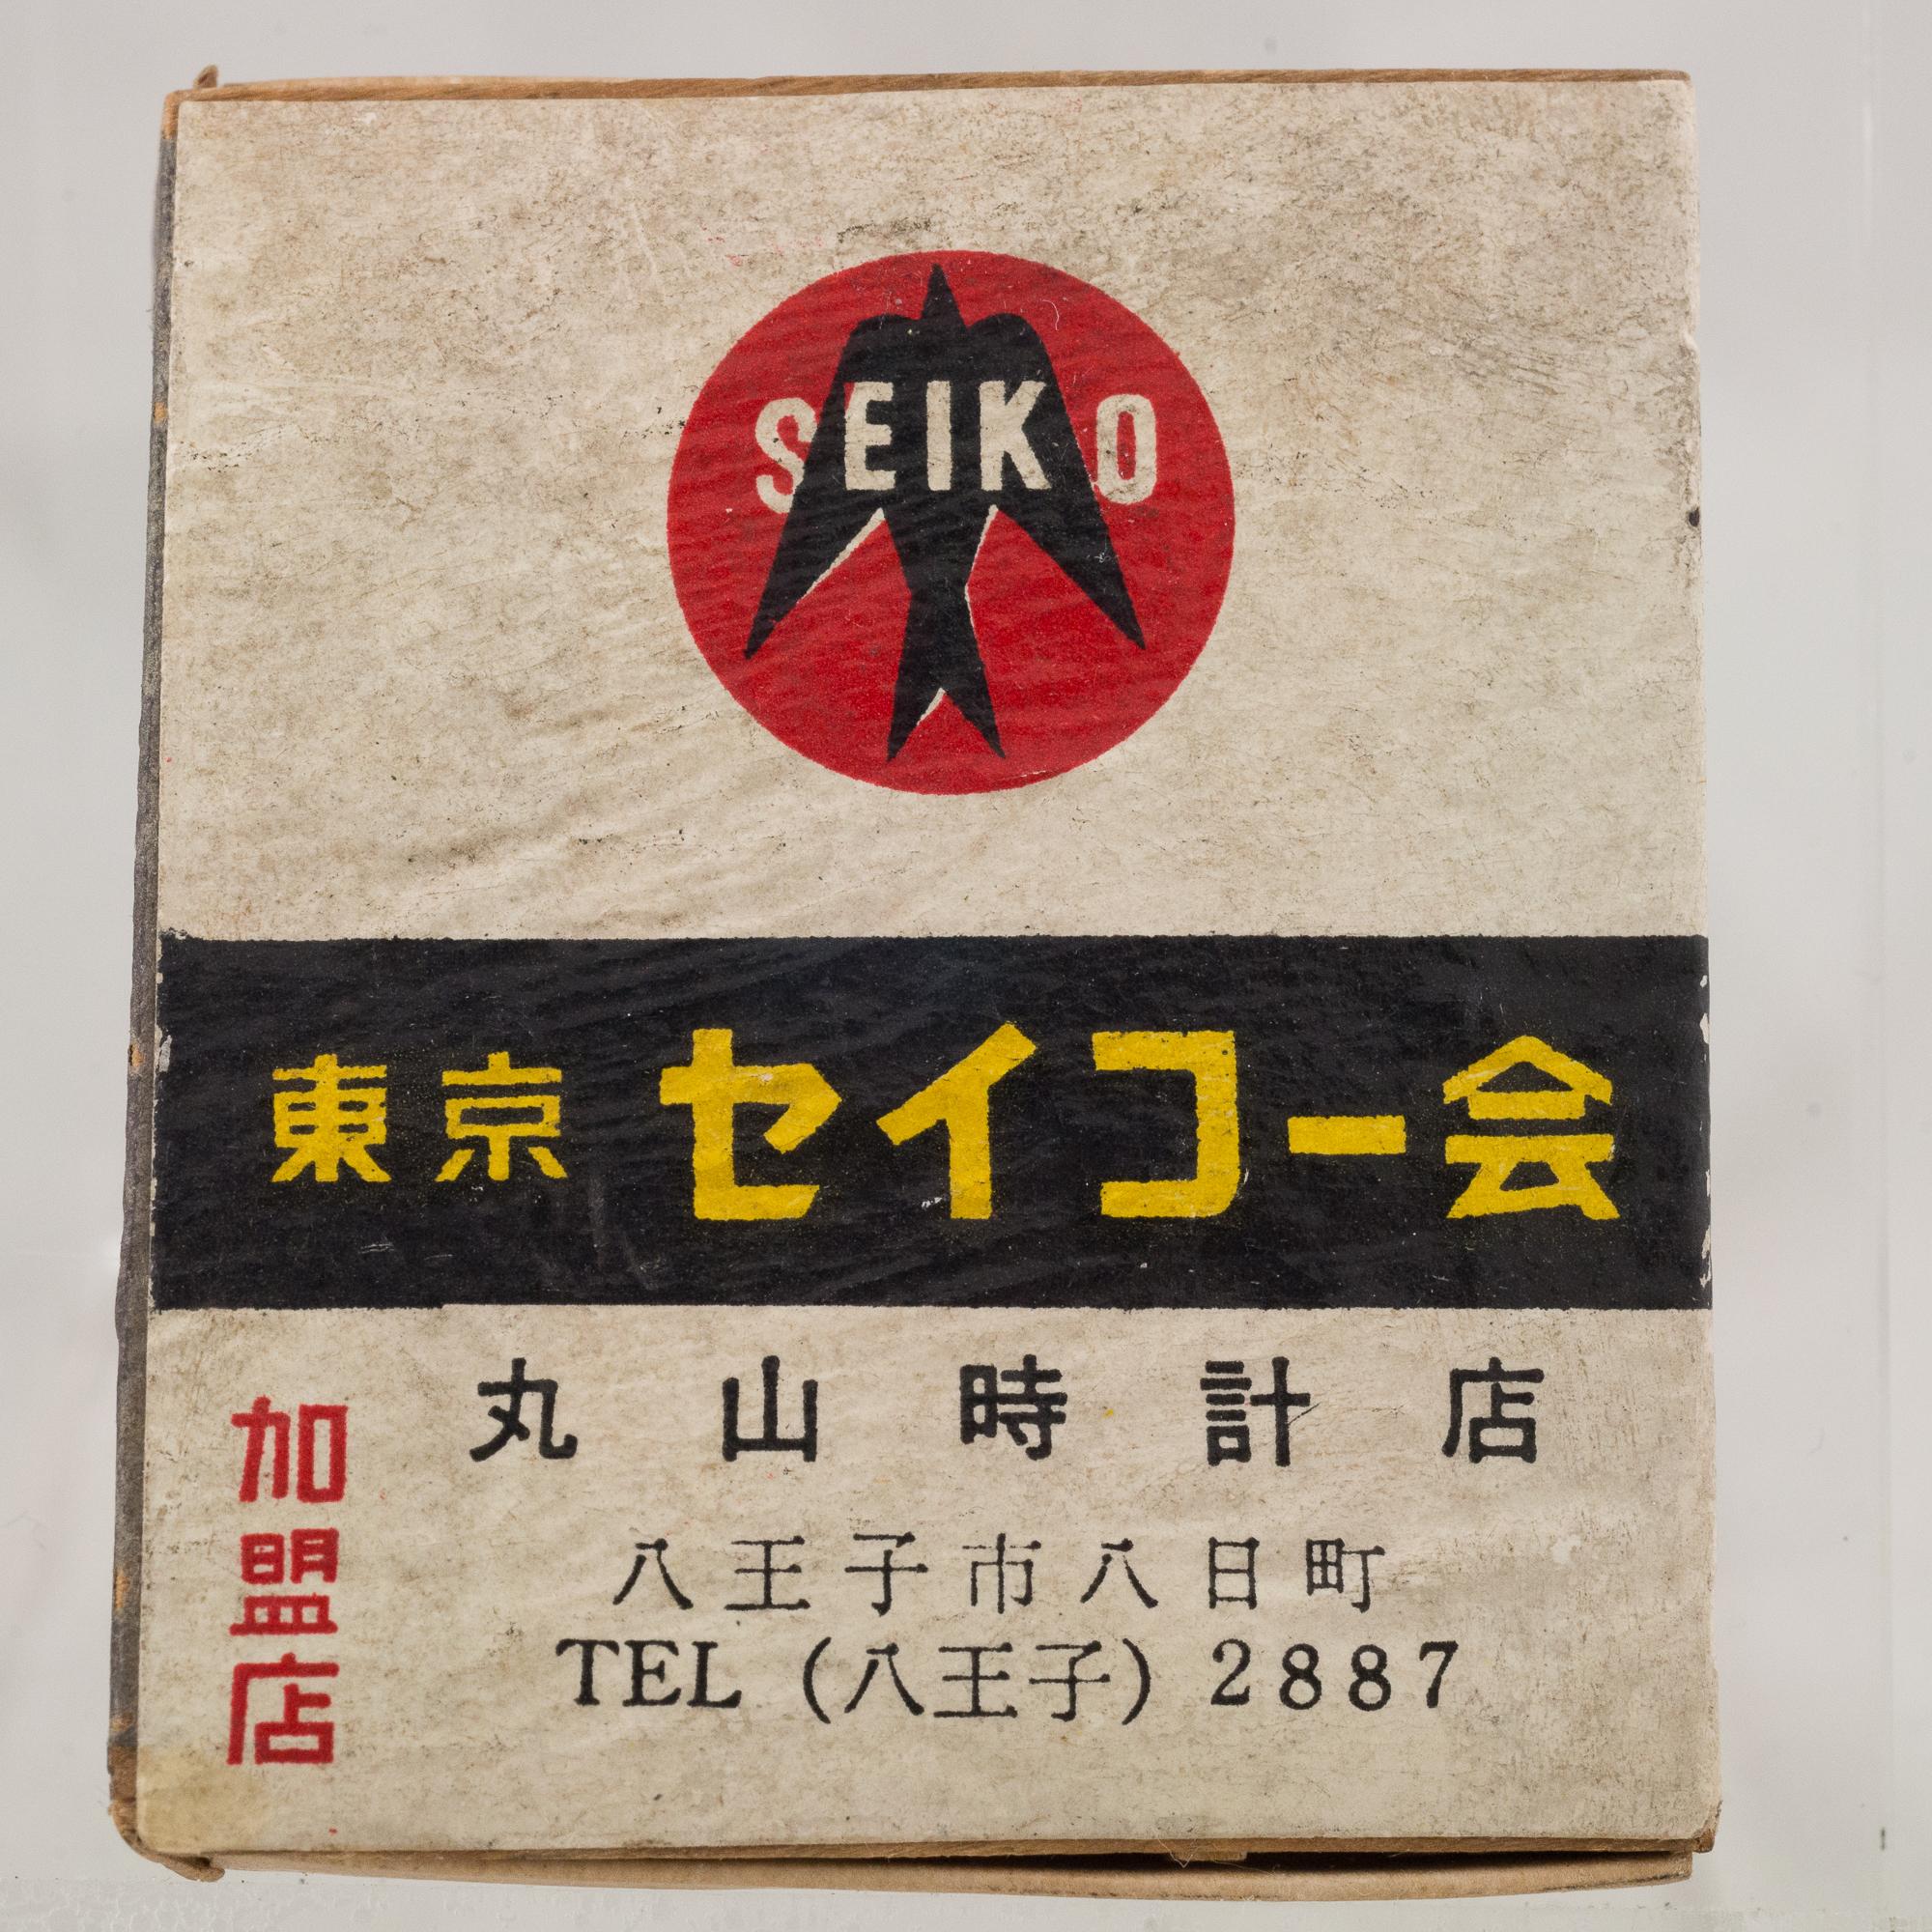 Tokyo Seiko Association Back